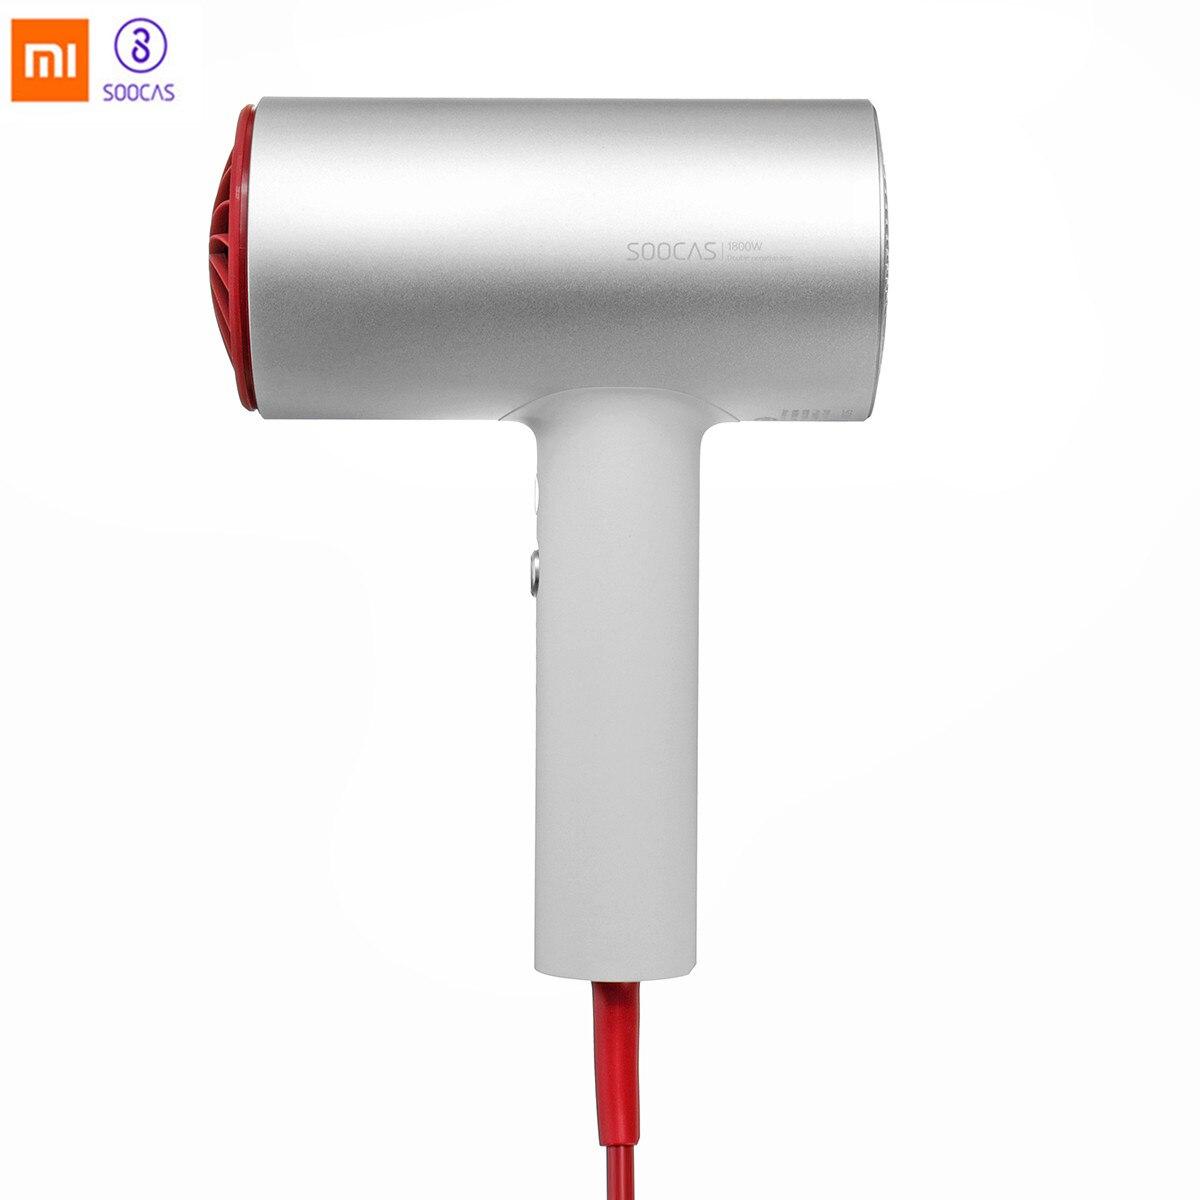 Xiaomi Mijia Soocas H3 Original Anion Haar Trockner Quick-dry Haar Werkzeuge Aluminium Legierung 1800 watt Air Outlet Anti -heiße Innovative Design